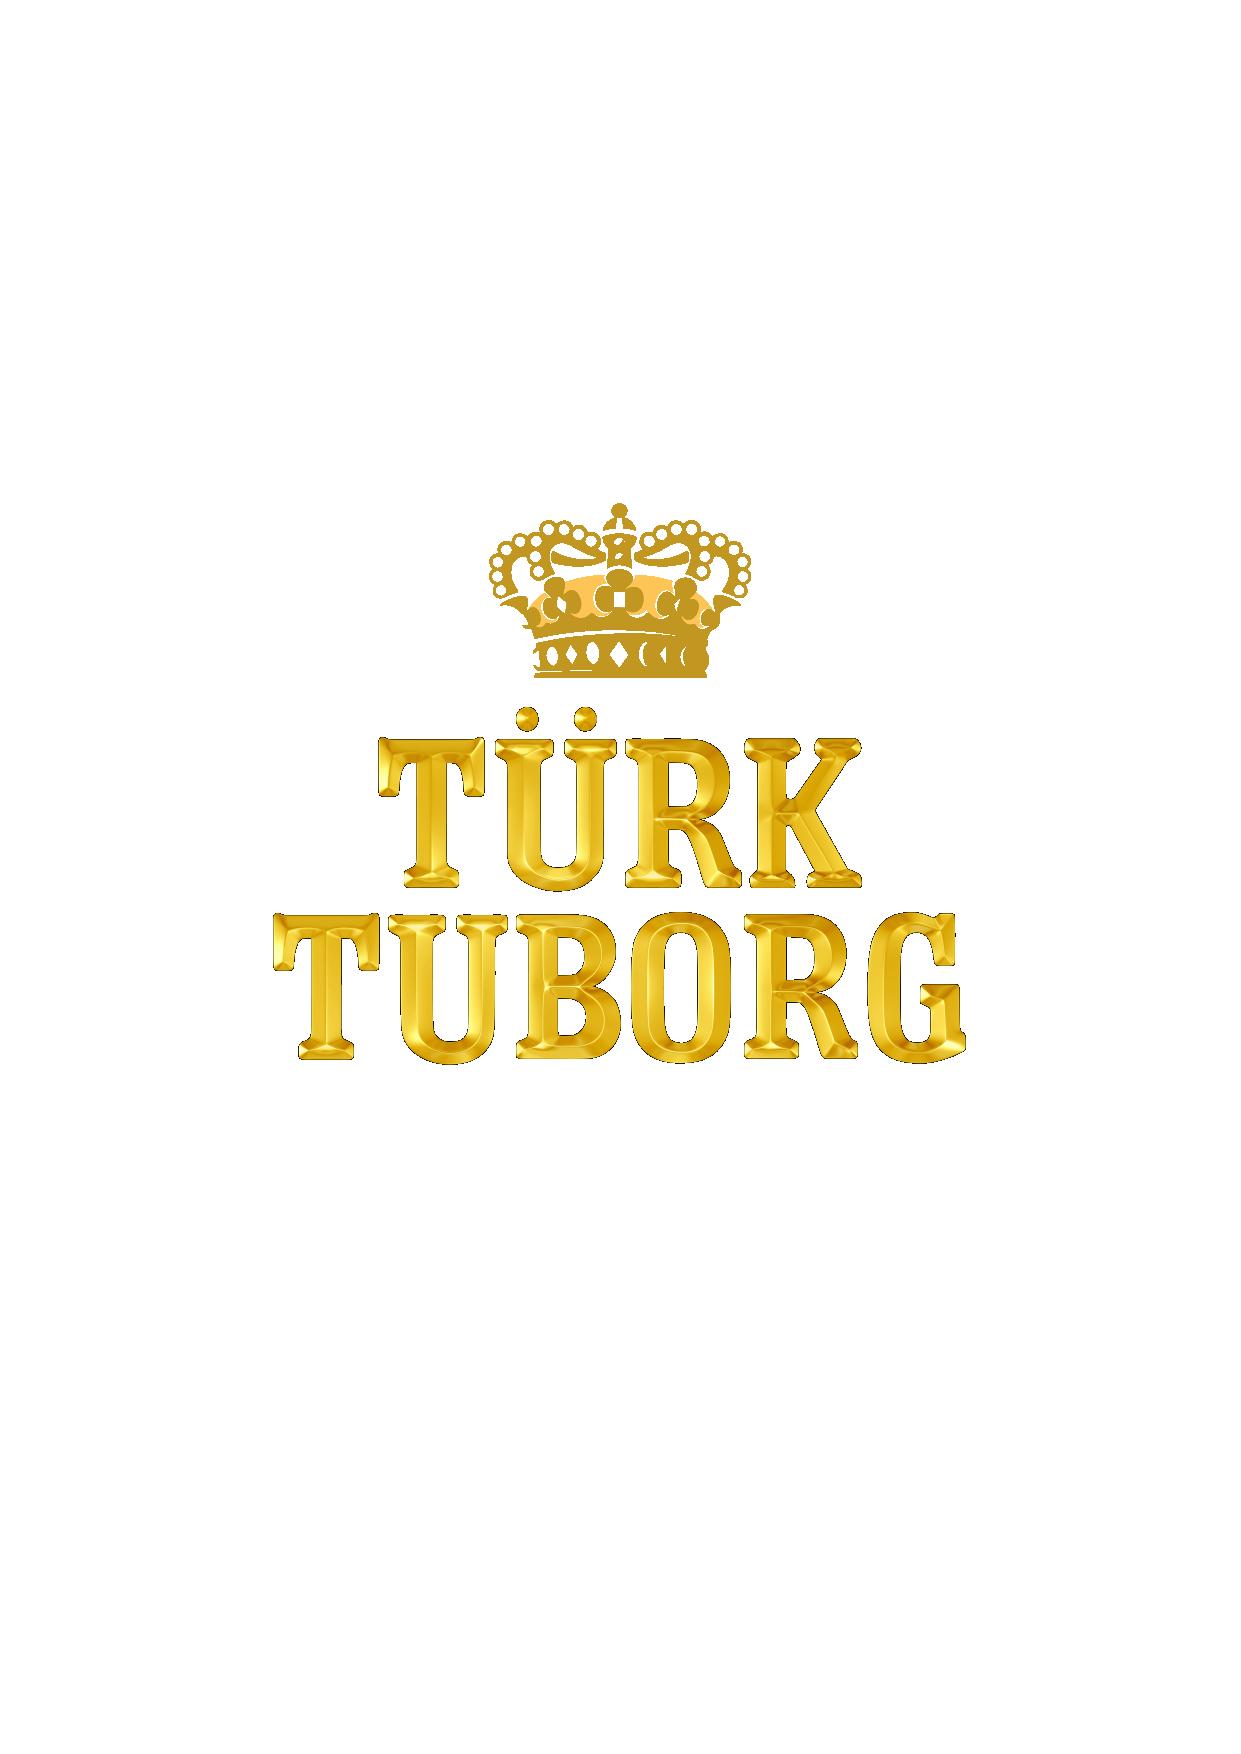 Tuborg_logo (1).png